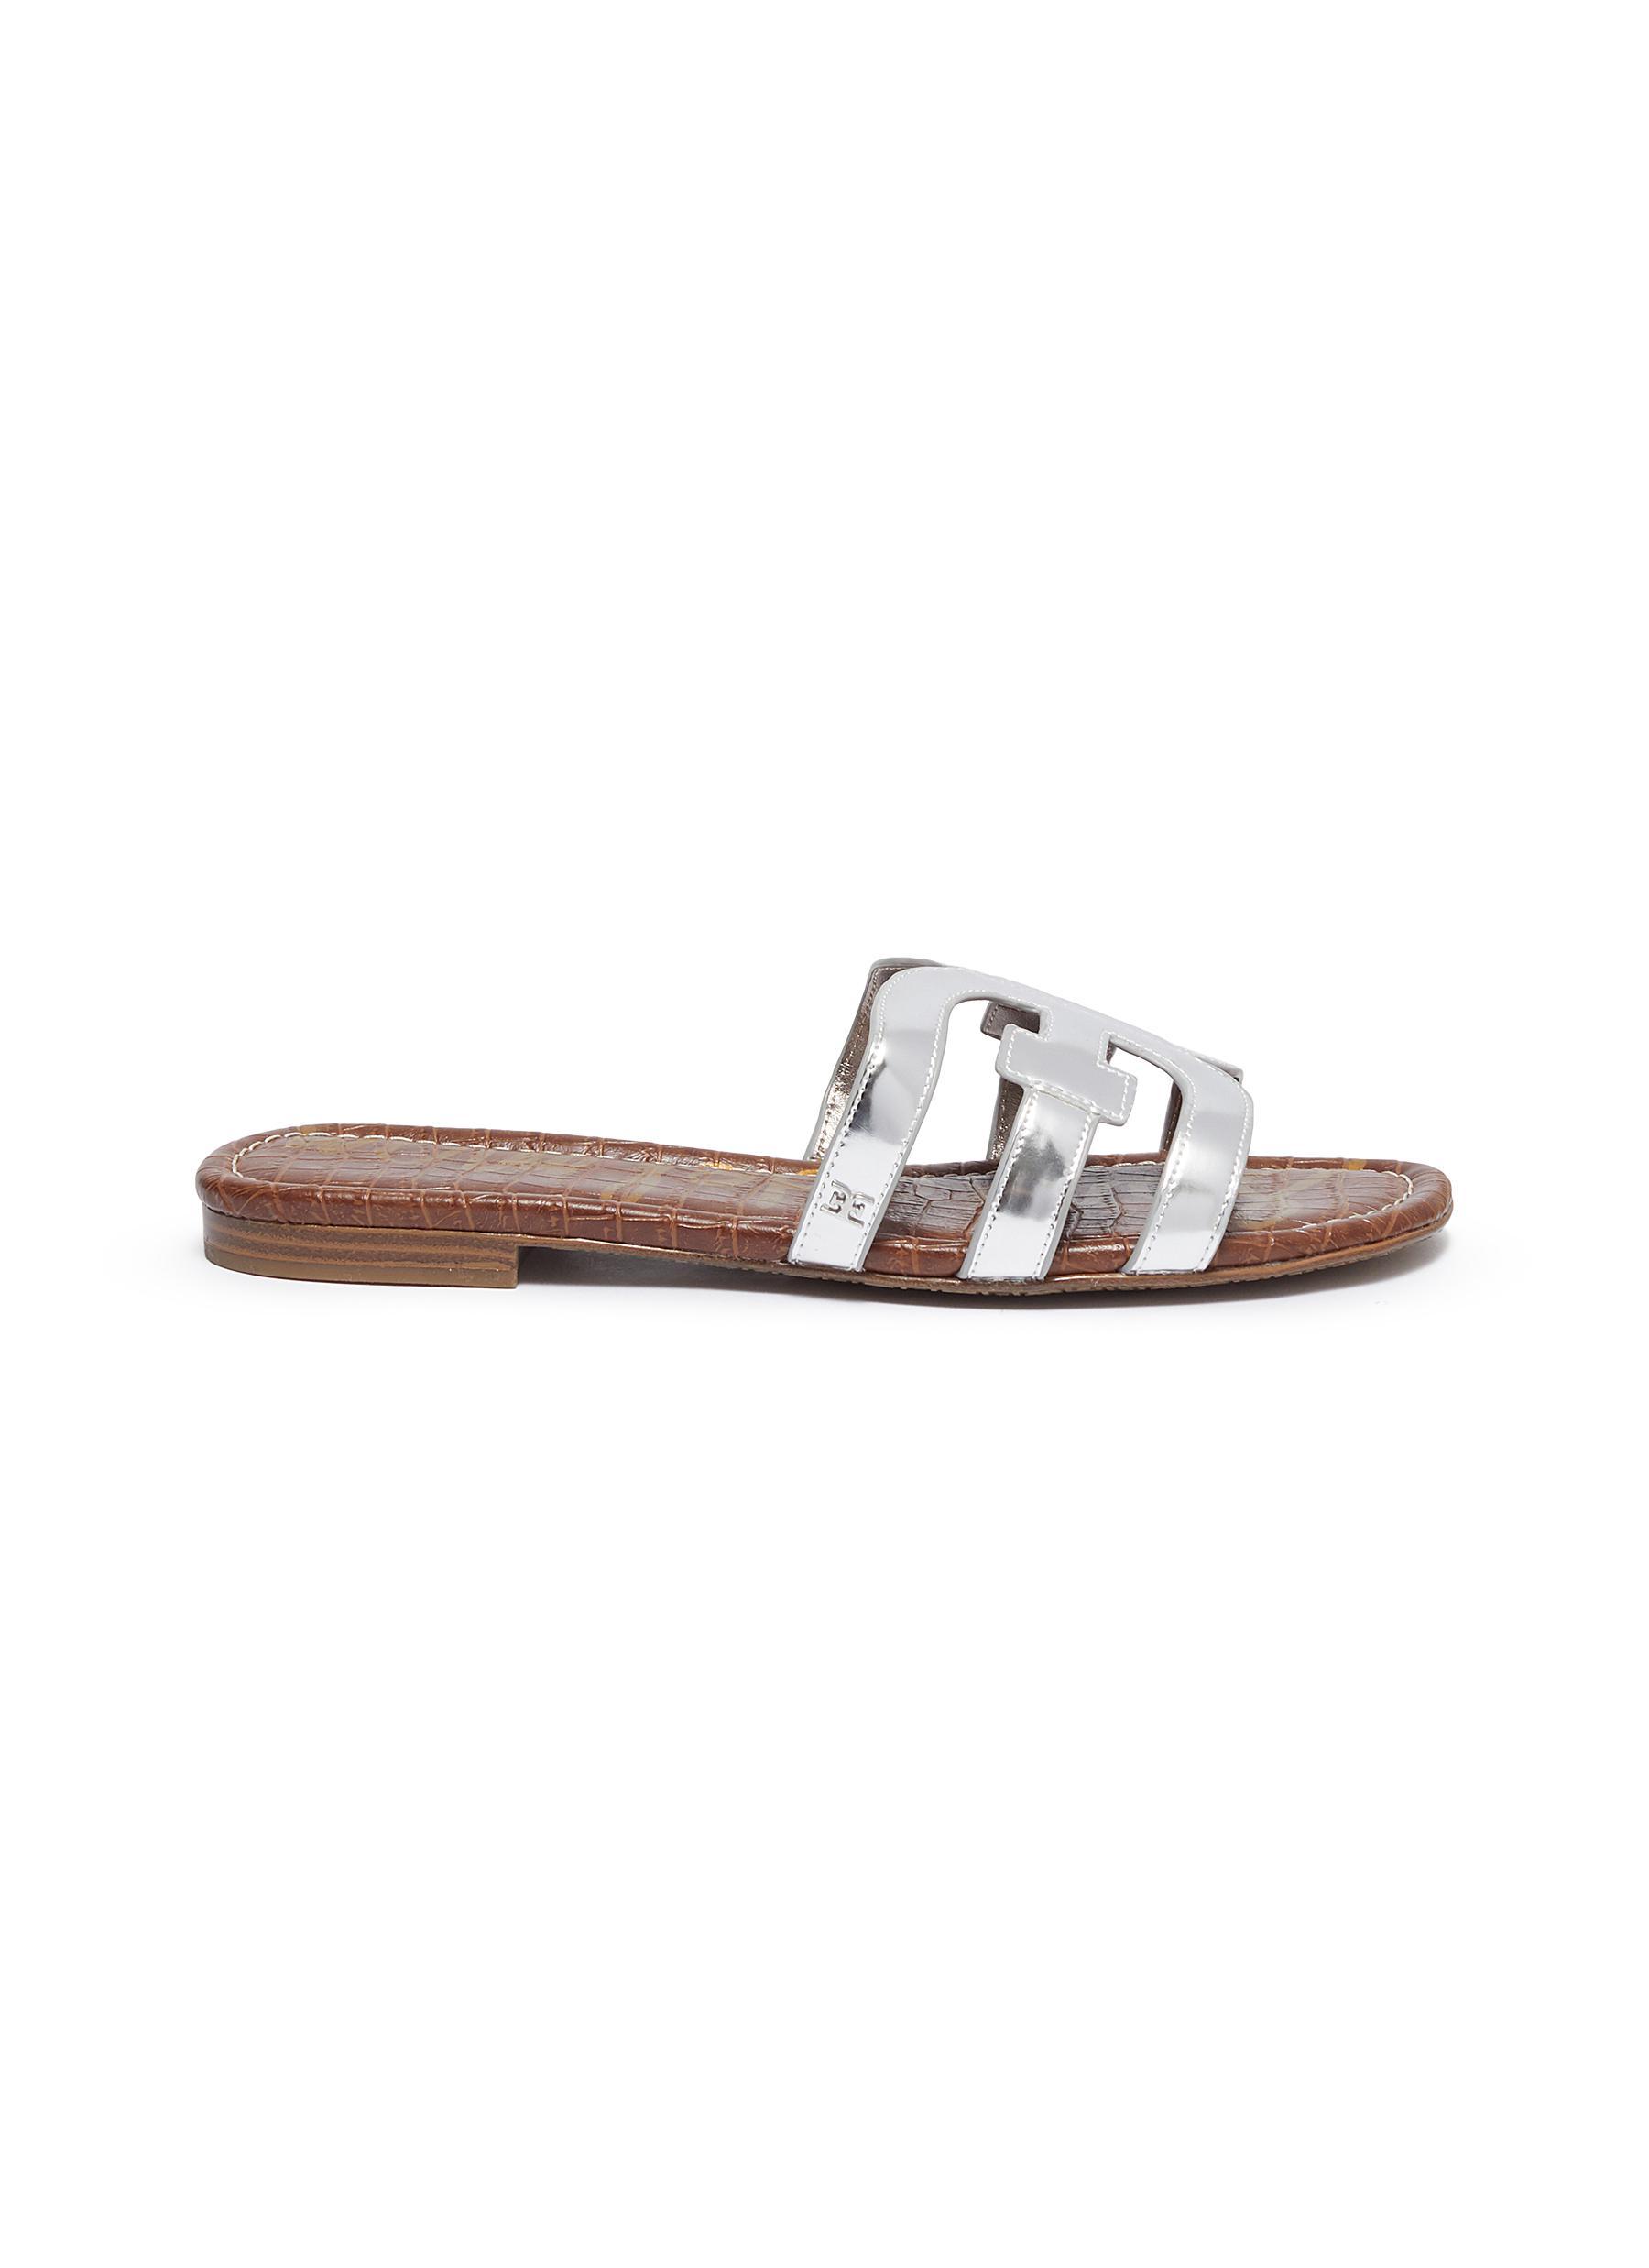 shop Sam Edelman 'Bay' metallic leather slide sandals online